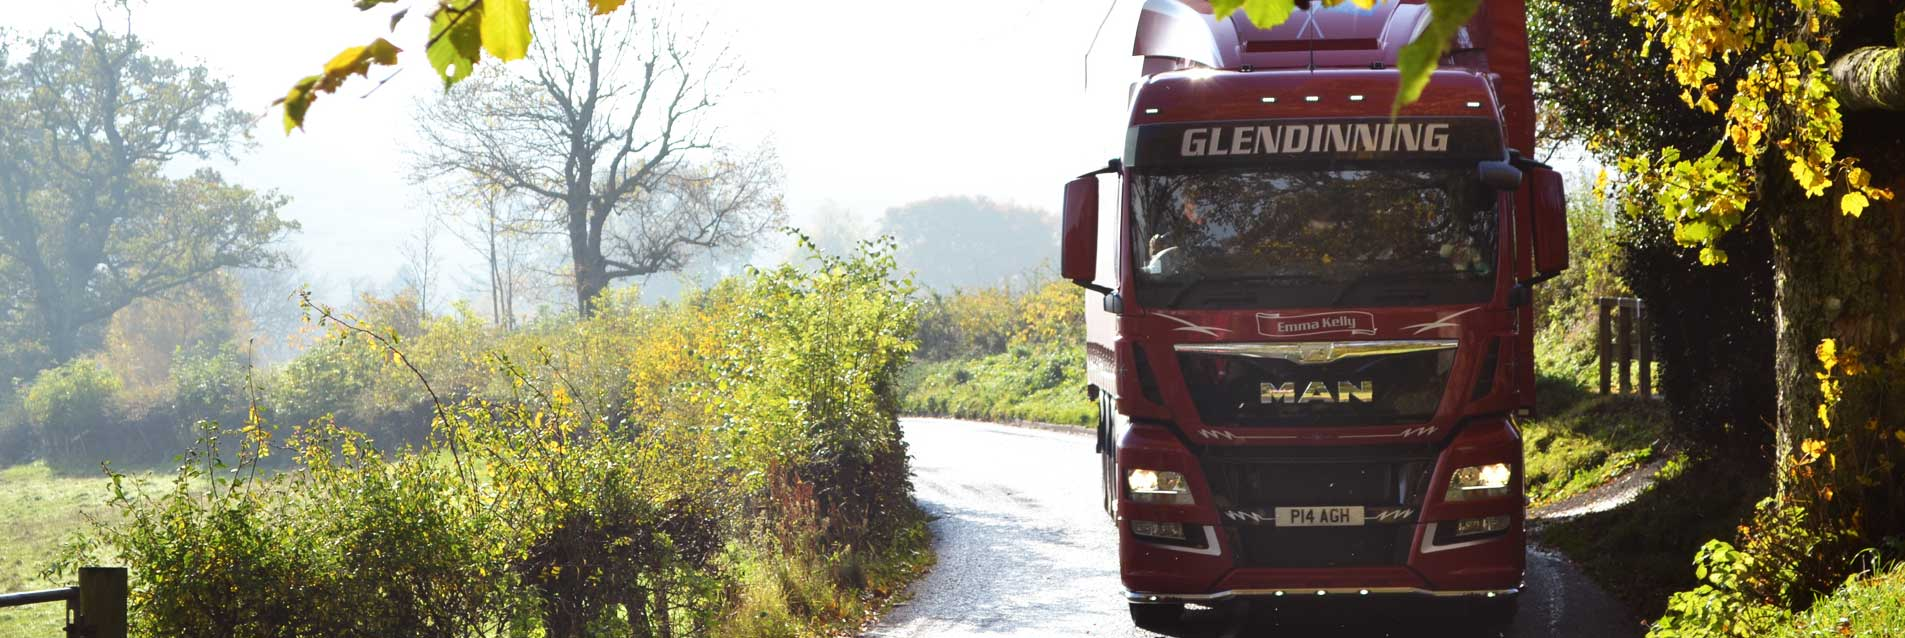 alan-glendinning-cumbria-haulage1